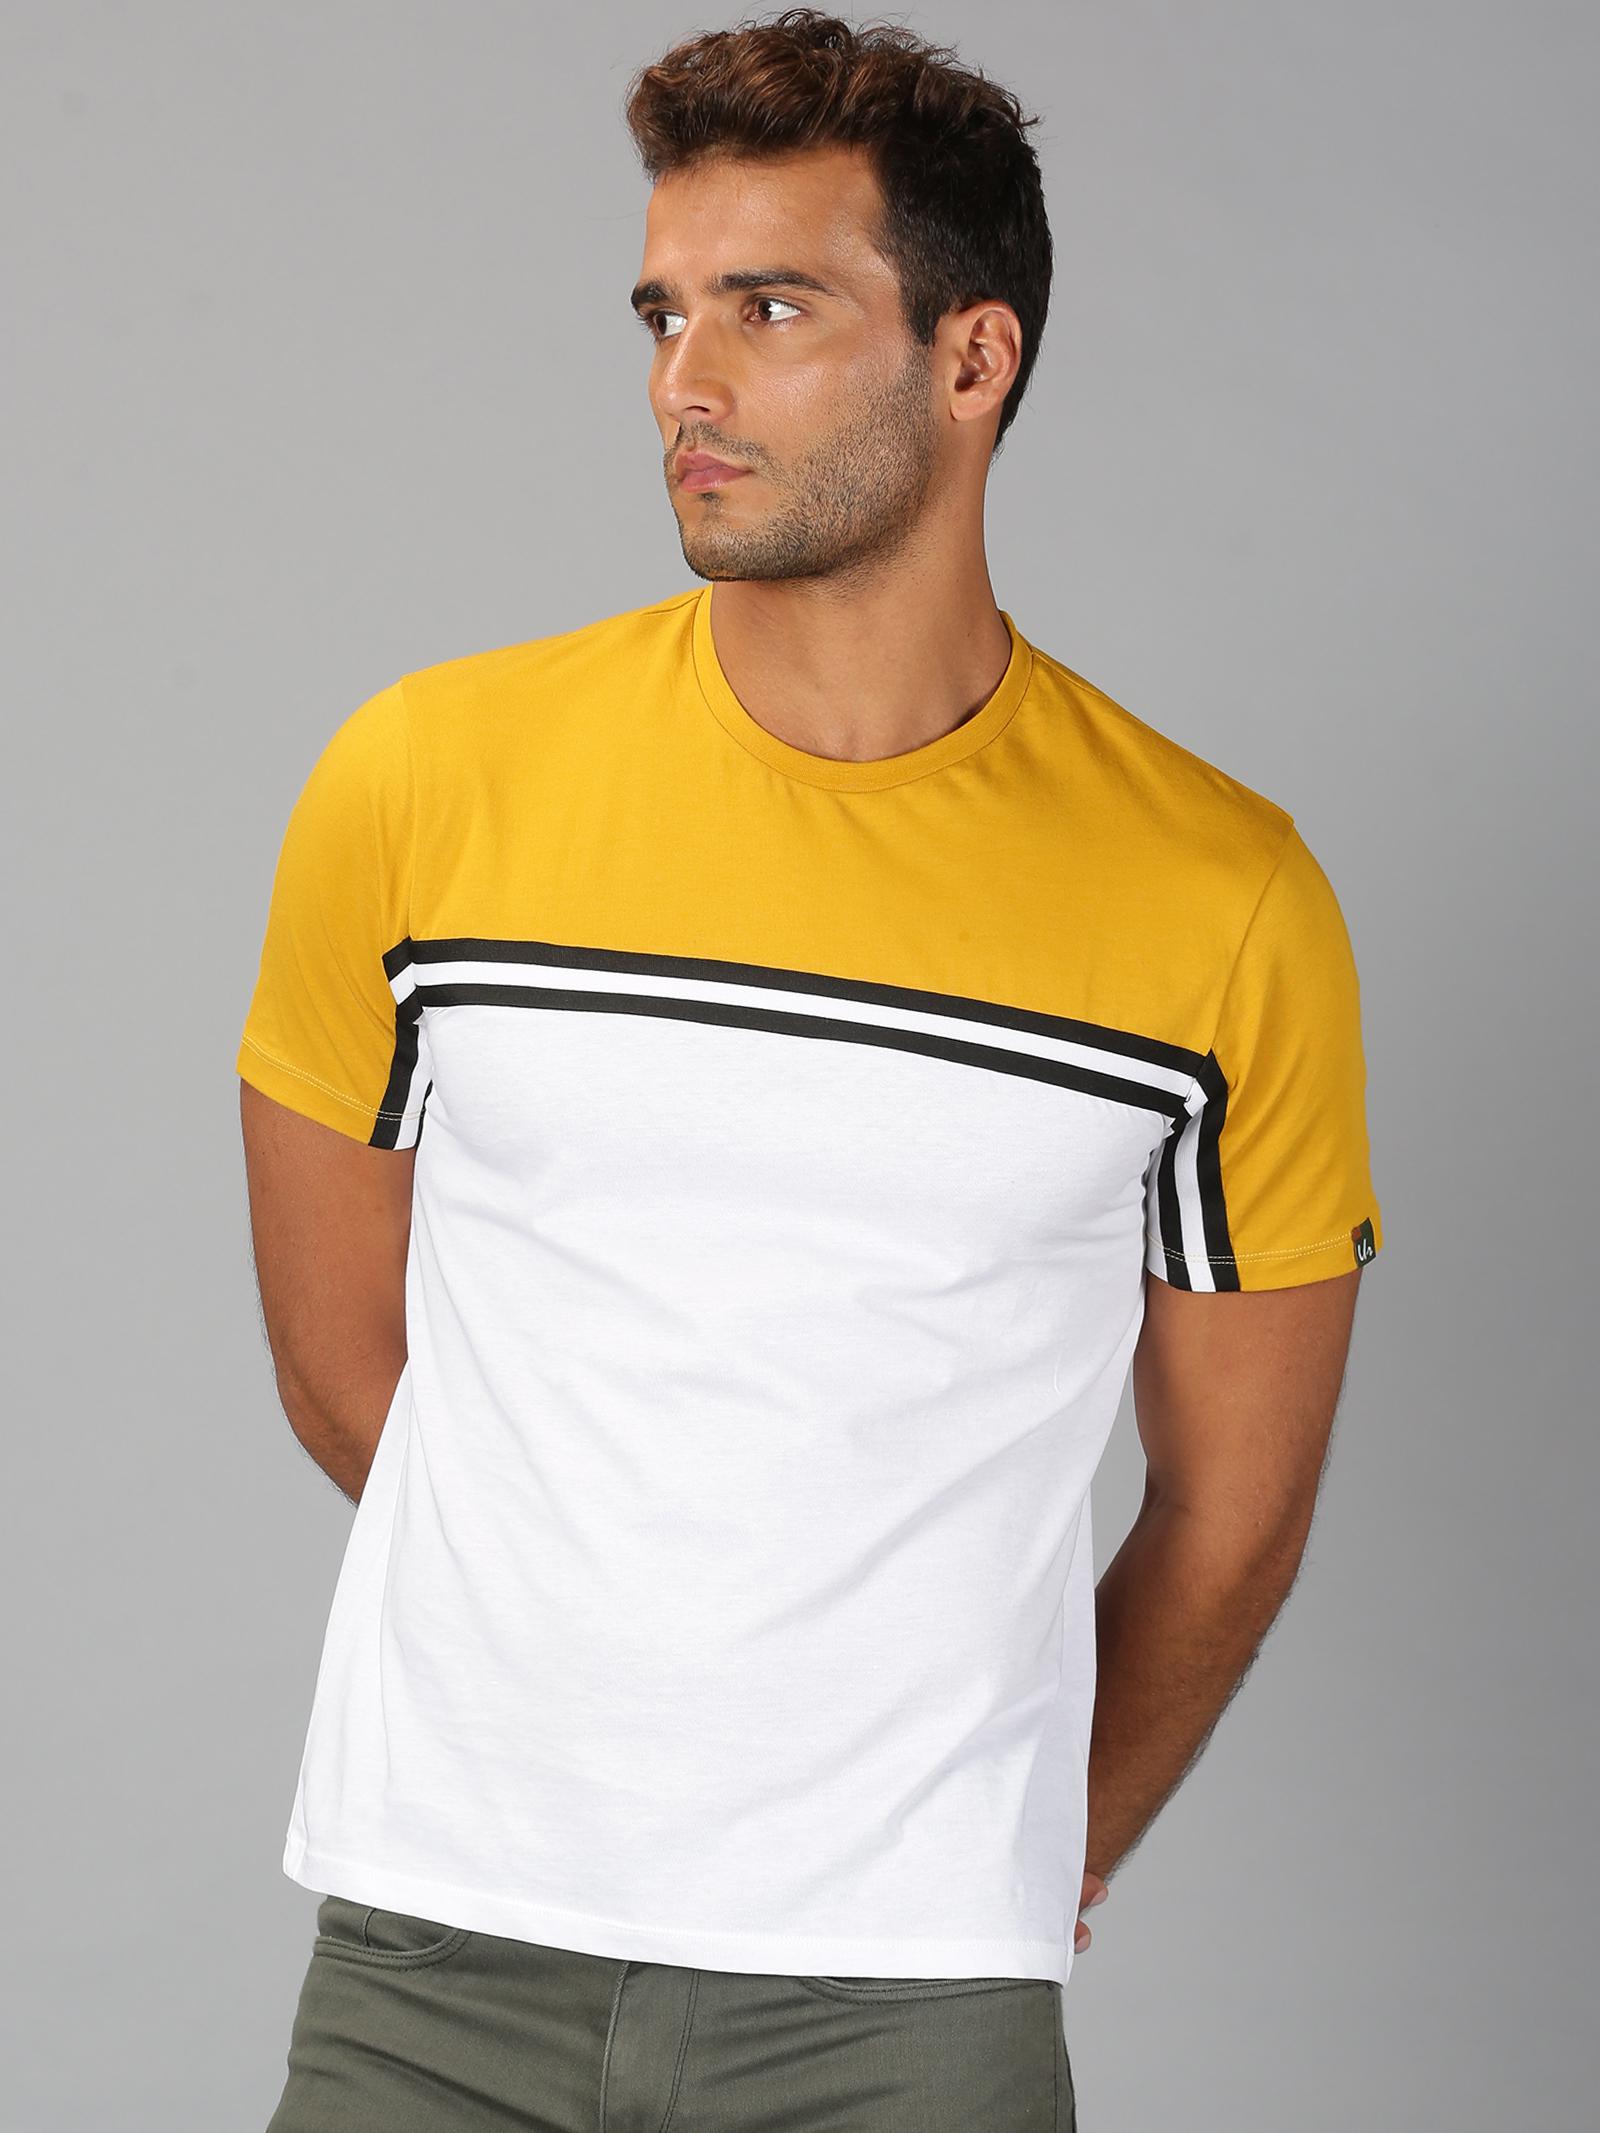 UrGear | Mens Round Neck Colourblock White & Yellow T-Shirt